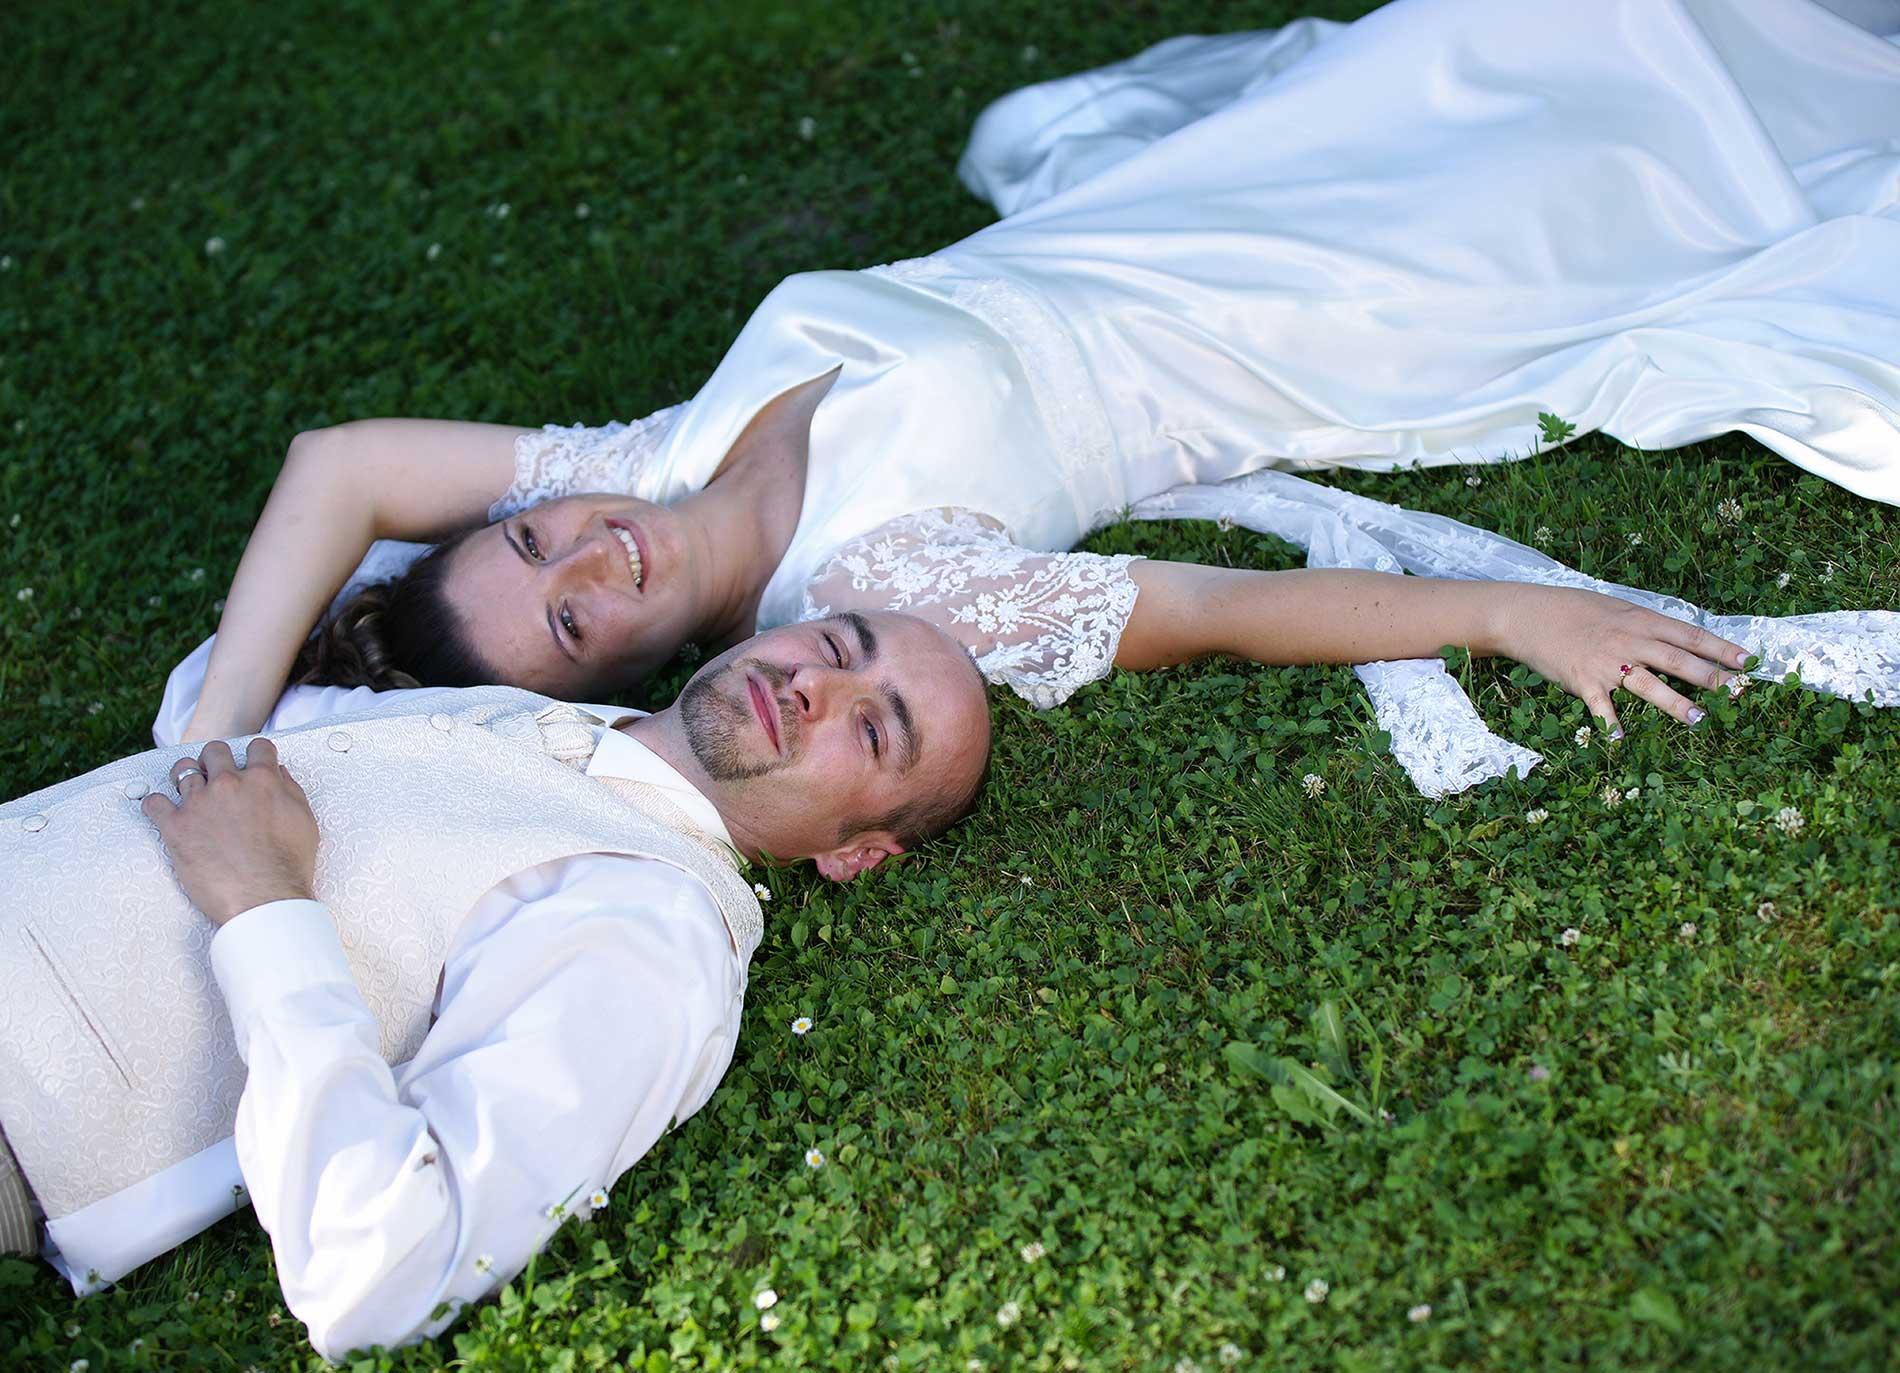 29 svatebni fotografie wedding in cesky krumlov zlata koruna trebon ceske budejovice jihocesky kraj jizni cechy svatebni fotograf lipno nad vltavou potret tehotenske foto svatby 1